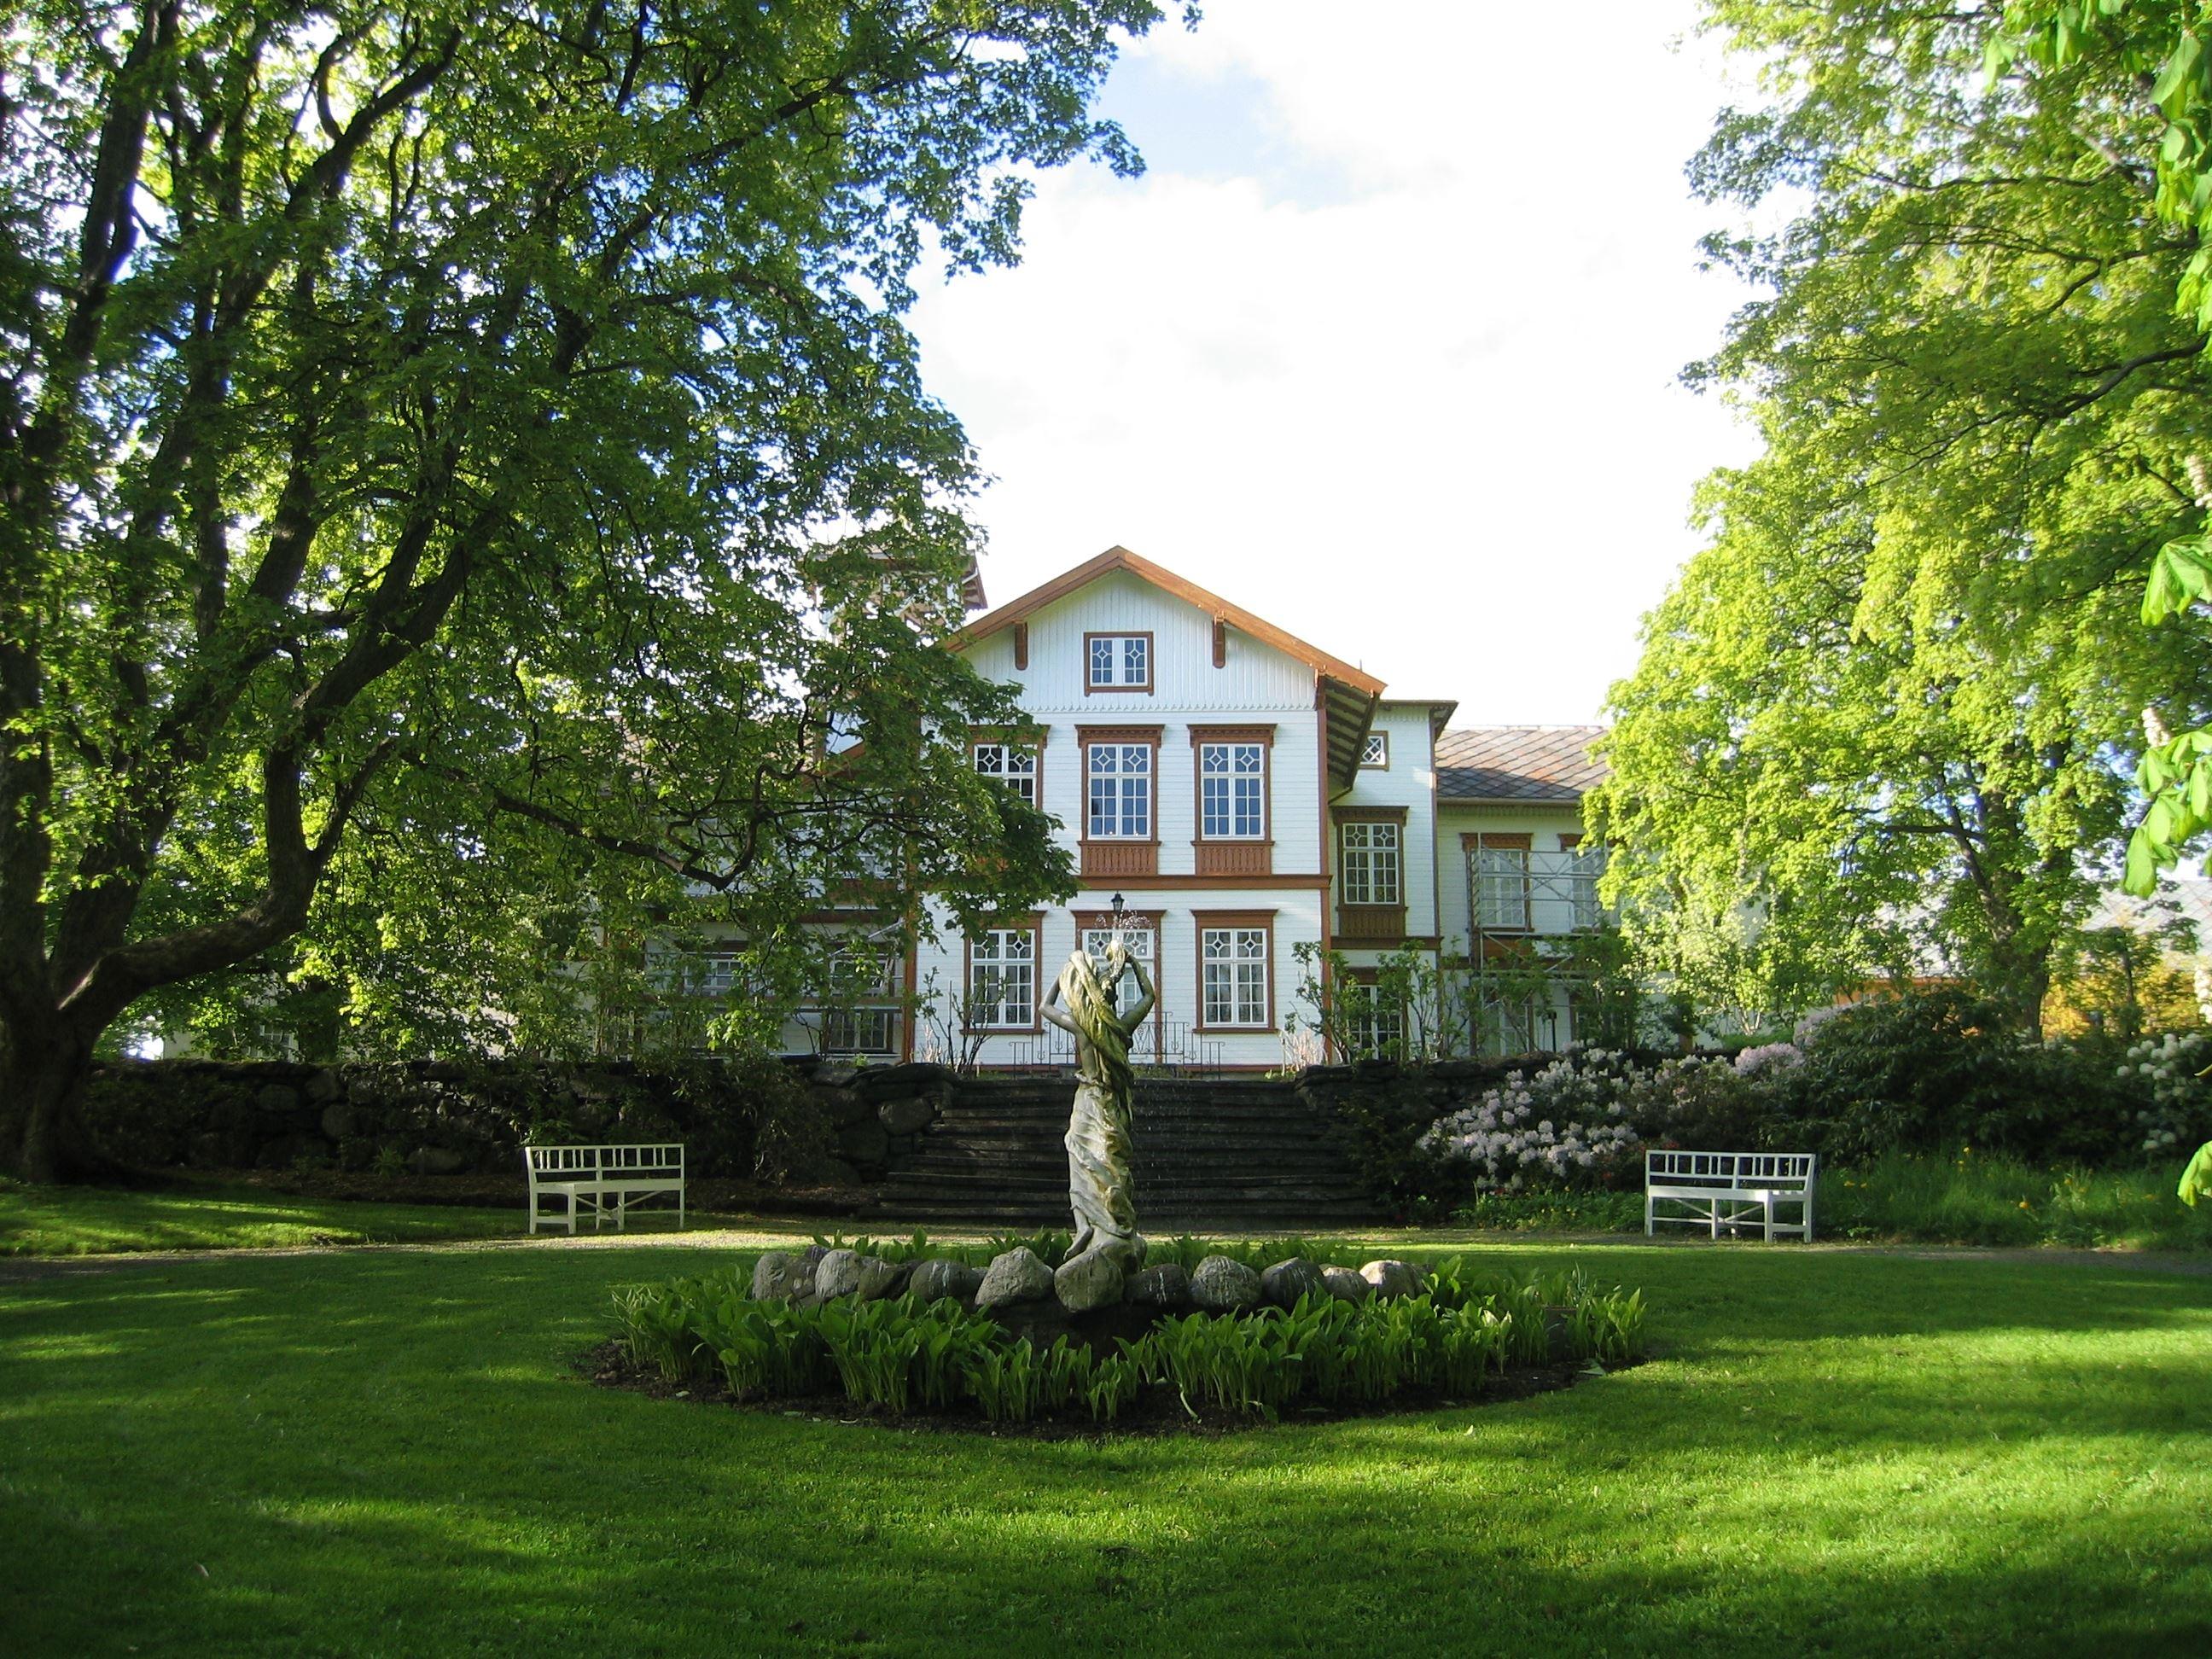 Ringve Musikkmuseum/Torbjørn Selven, Ringve Music Museum